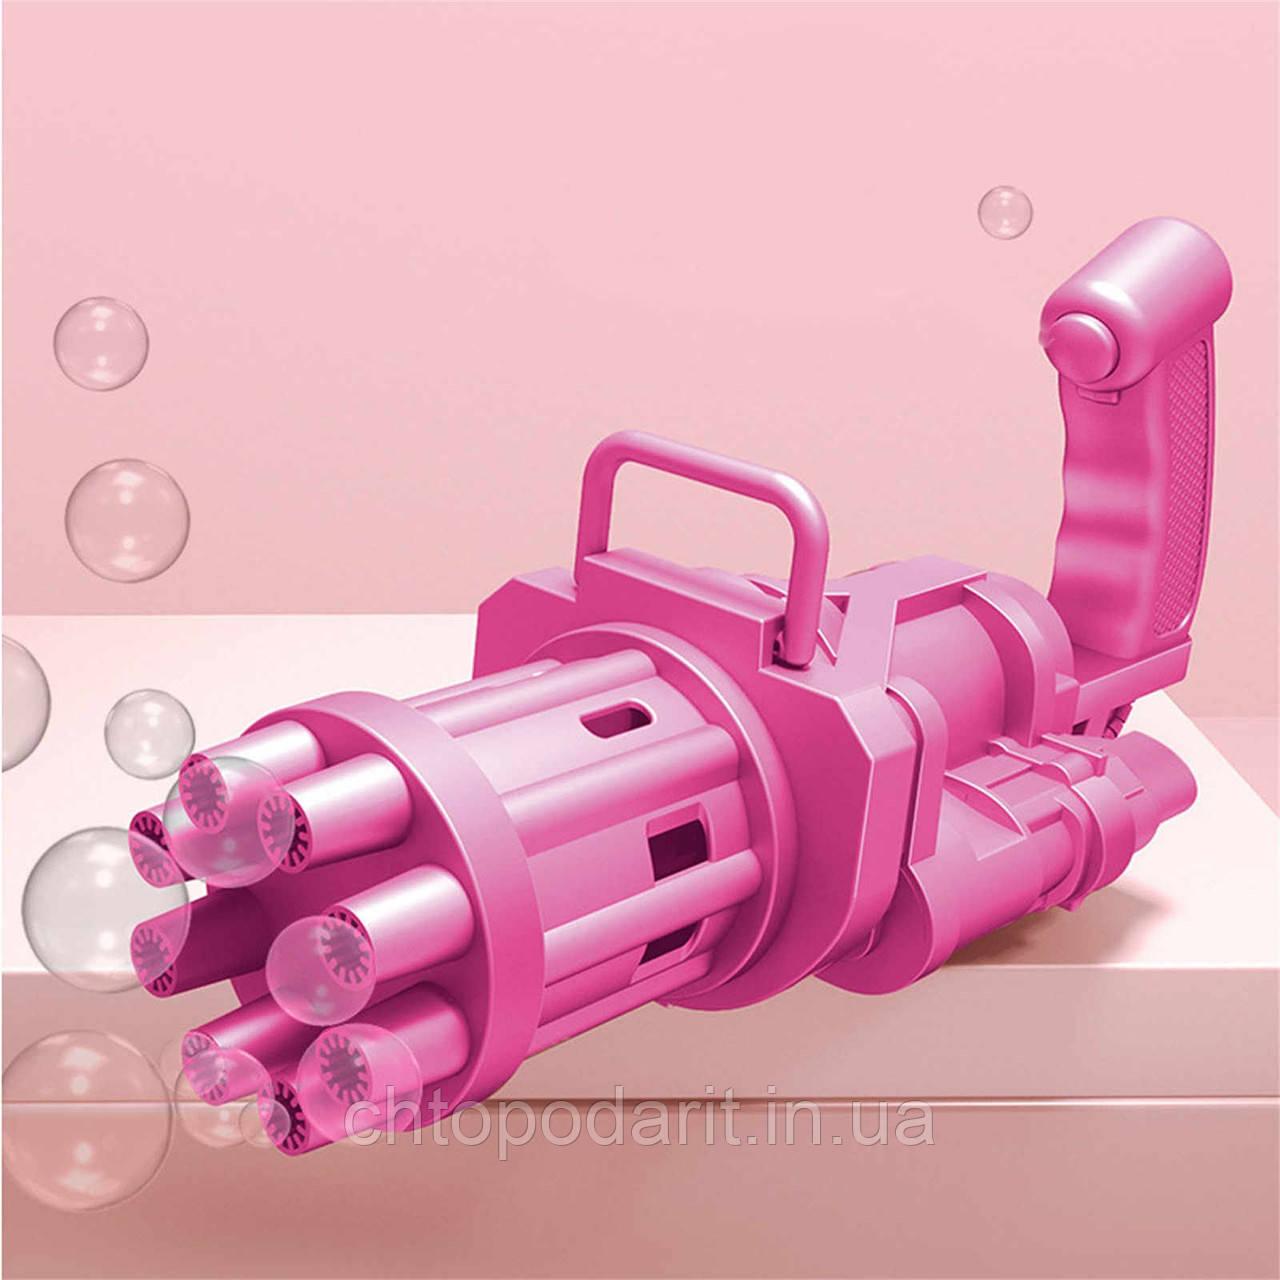 Кулемет генератор мильних бульбашок BUBBLE GUN BLASTER машинка для бульбашок автомат чорний код 10-1037